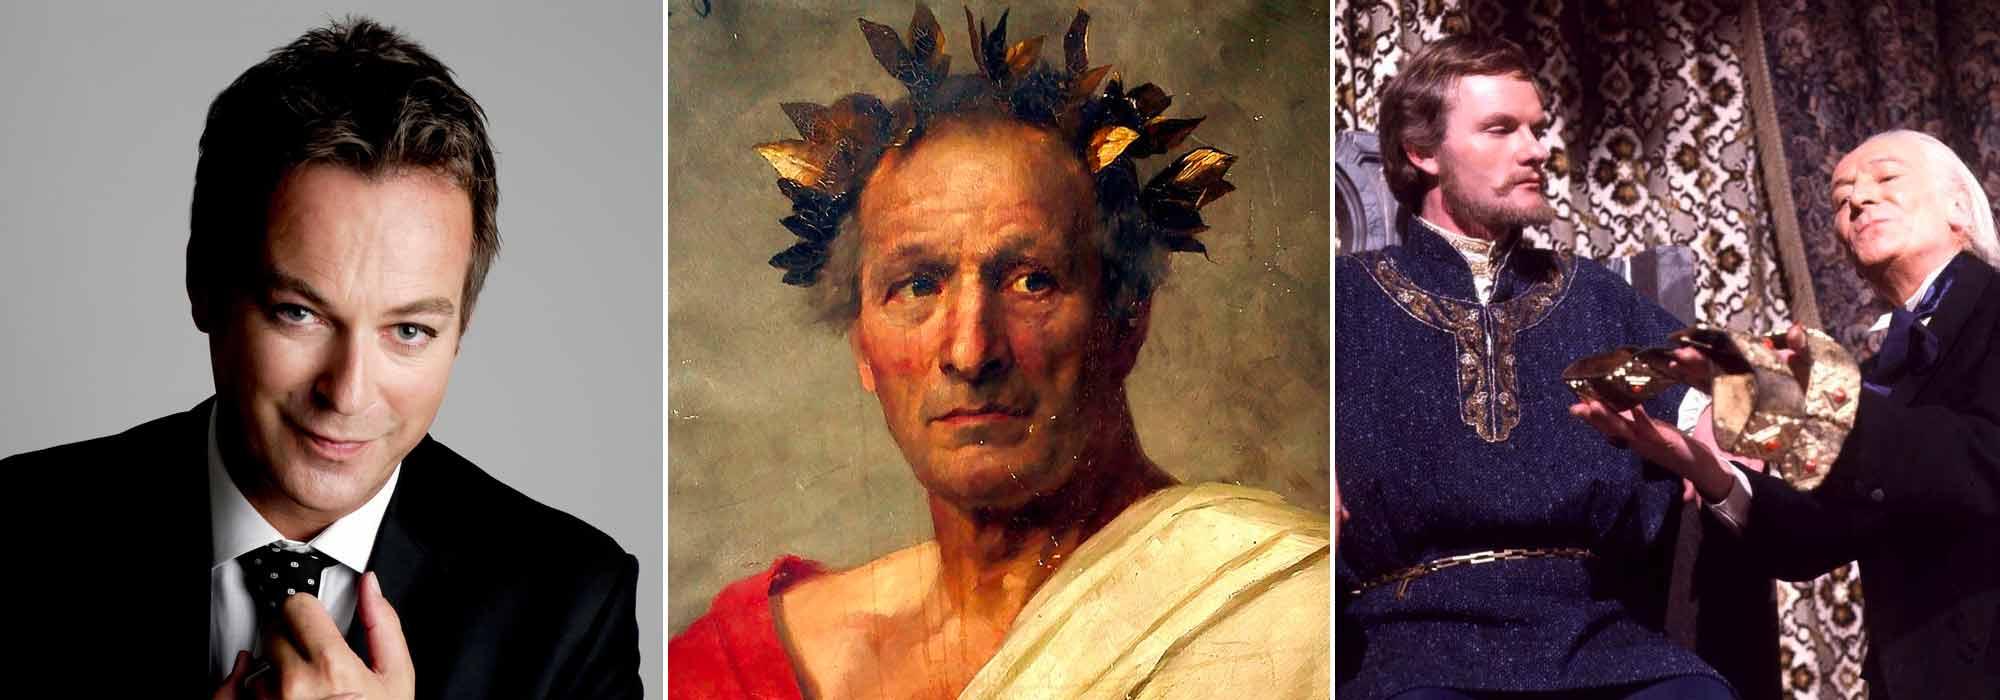 A) Julian Clary B) Julius Caesar C) Julian Glover